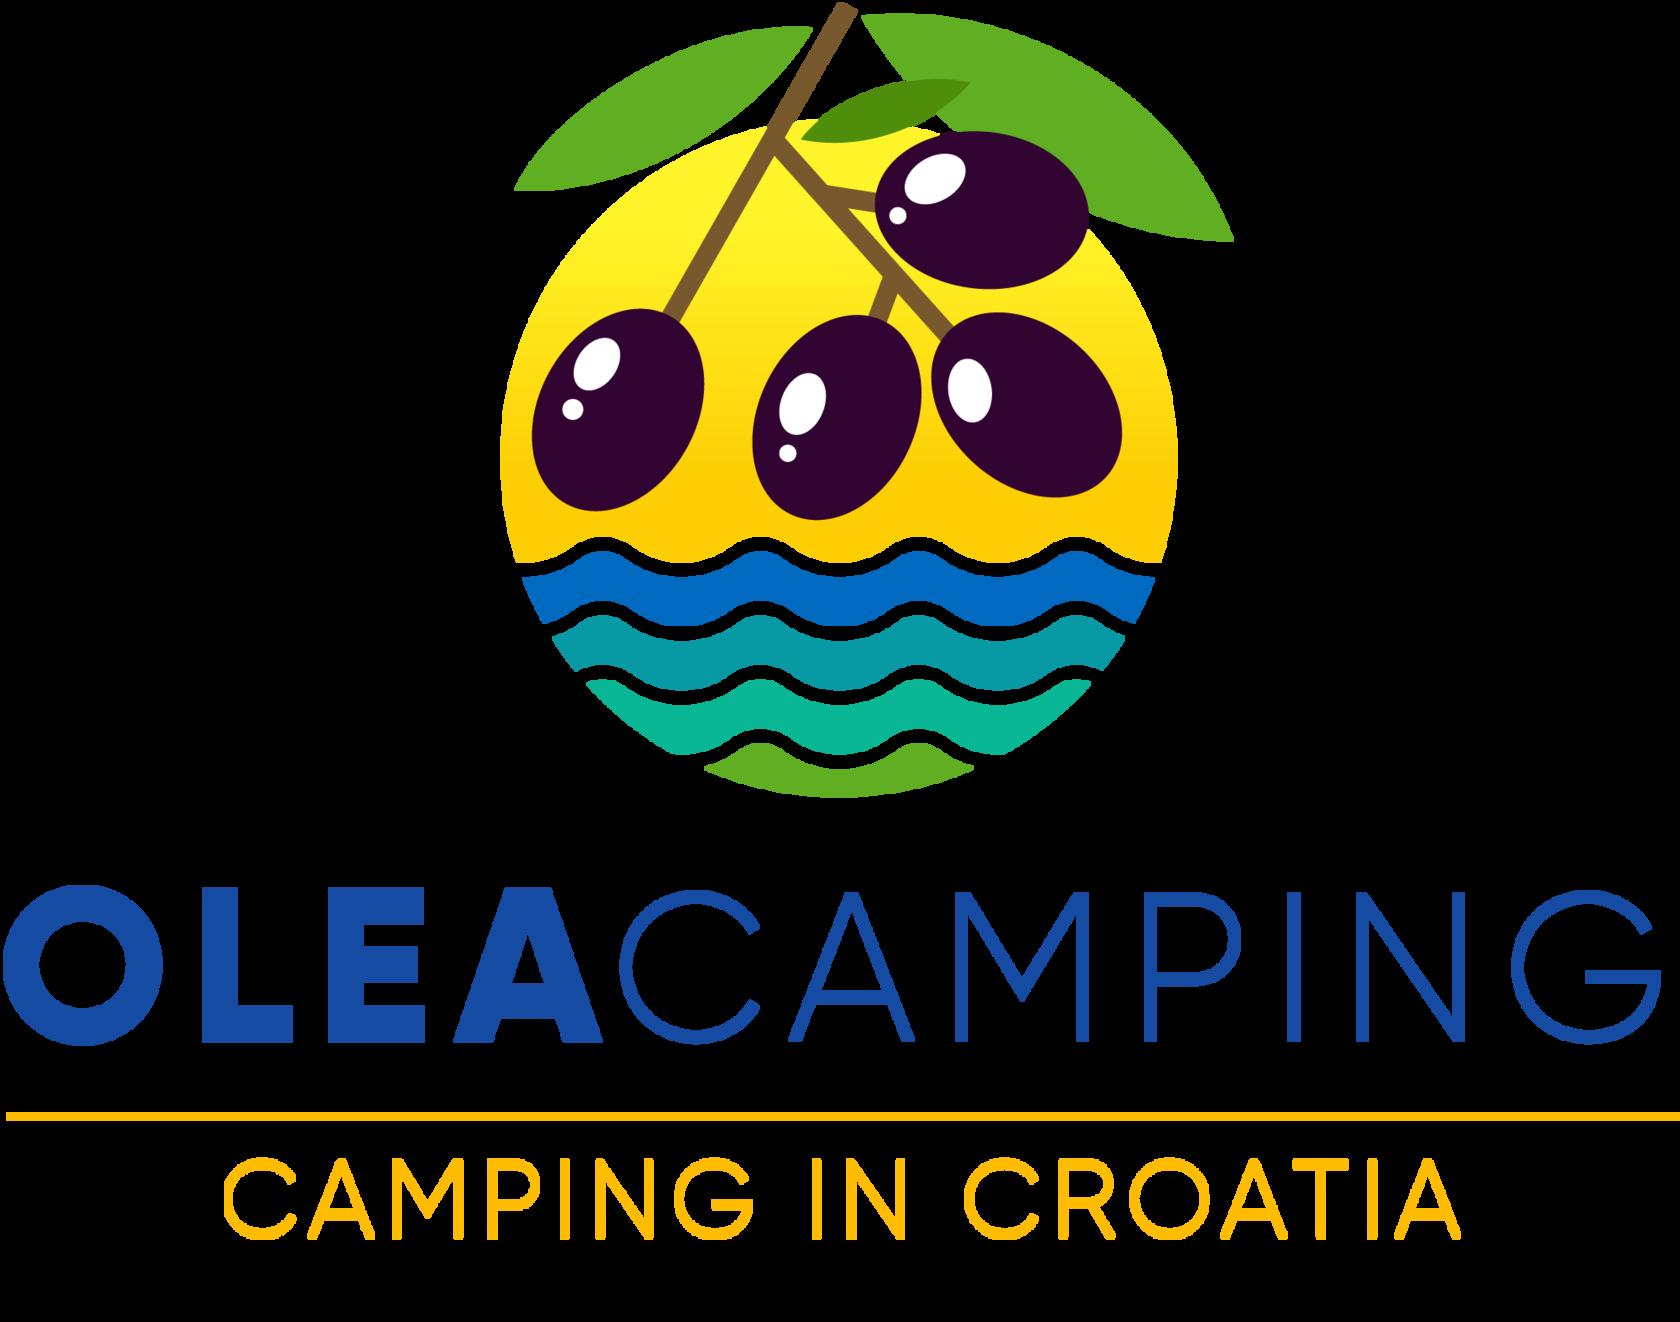 olea-camping-logo